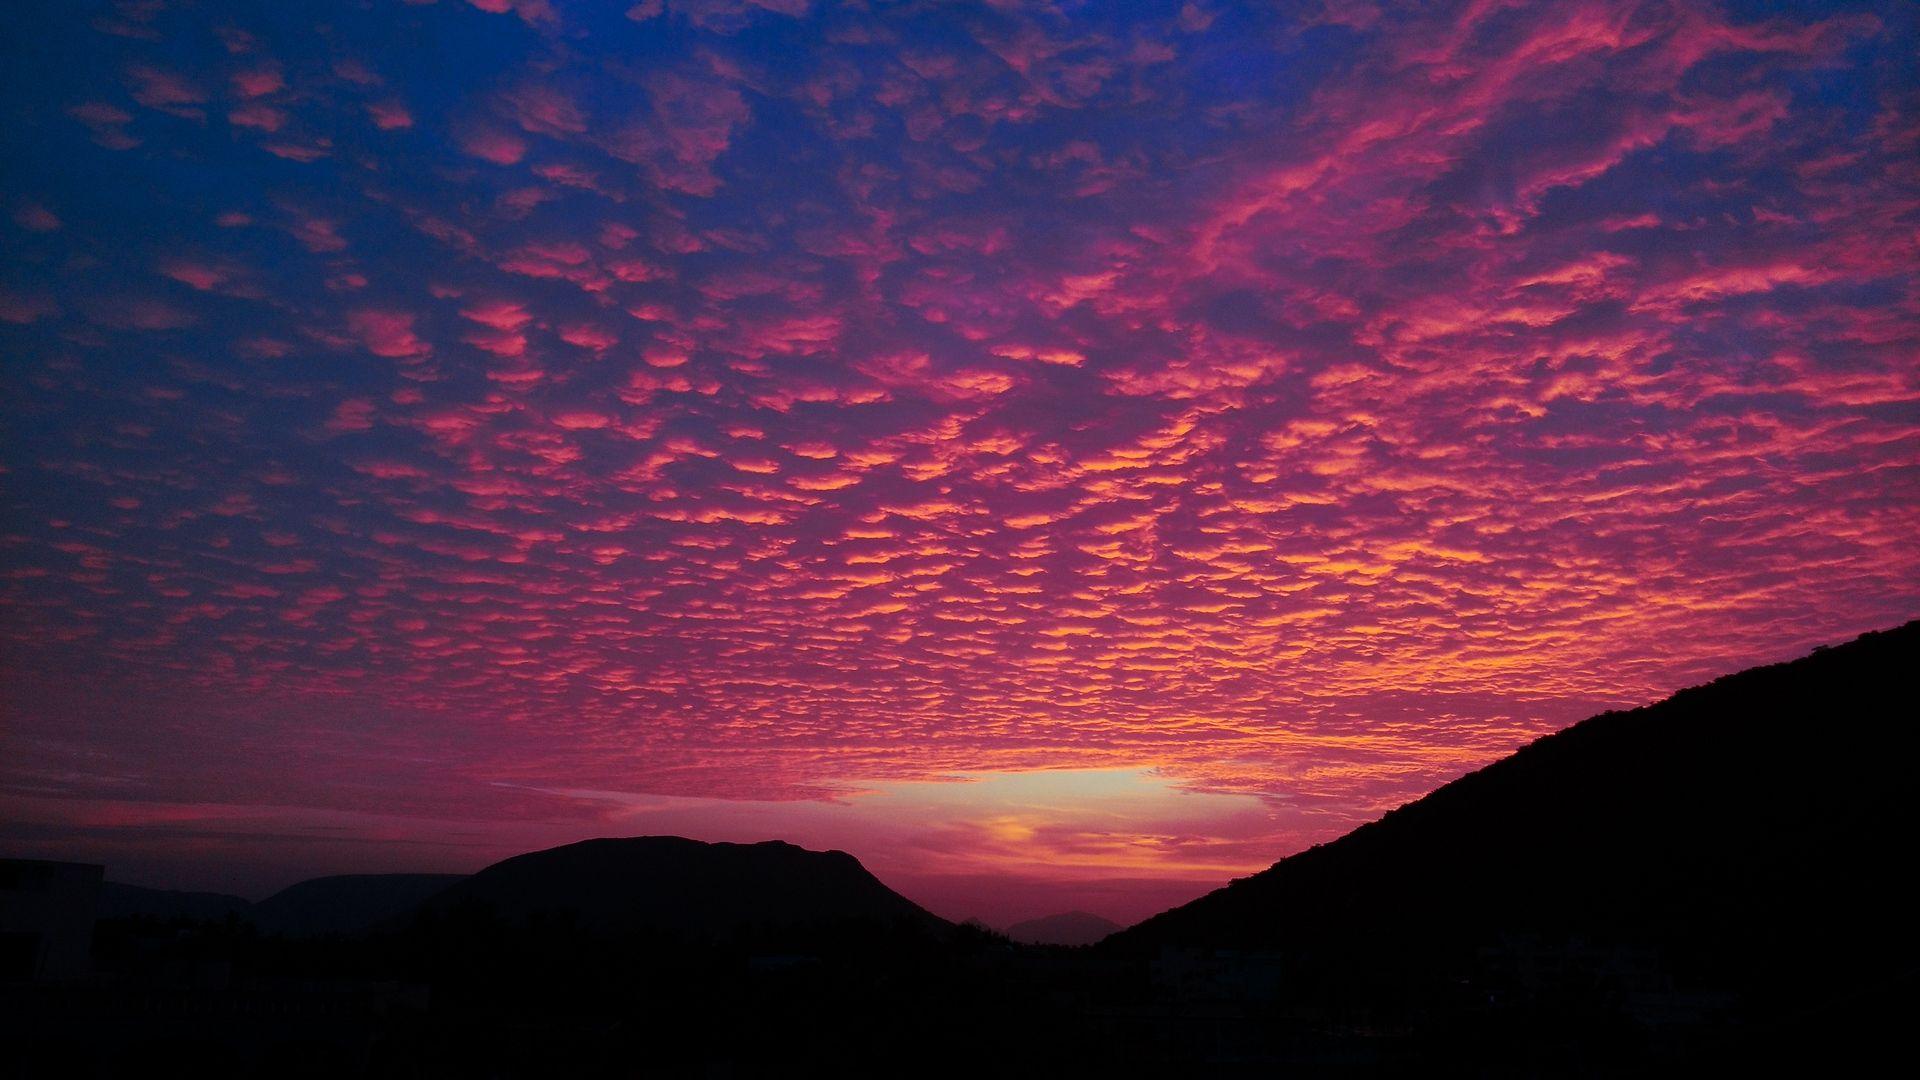 Wallpaper Porous Evening Hills Clouds Sunset Forest Resort Clouds Sunset Best Resorts Hd wallpaper sunset clouds road hills